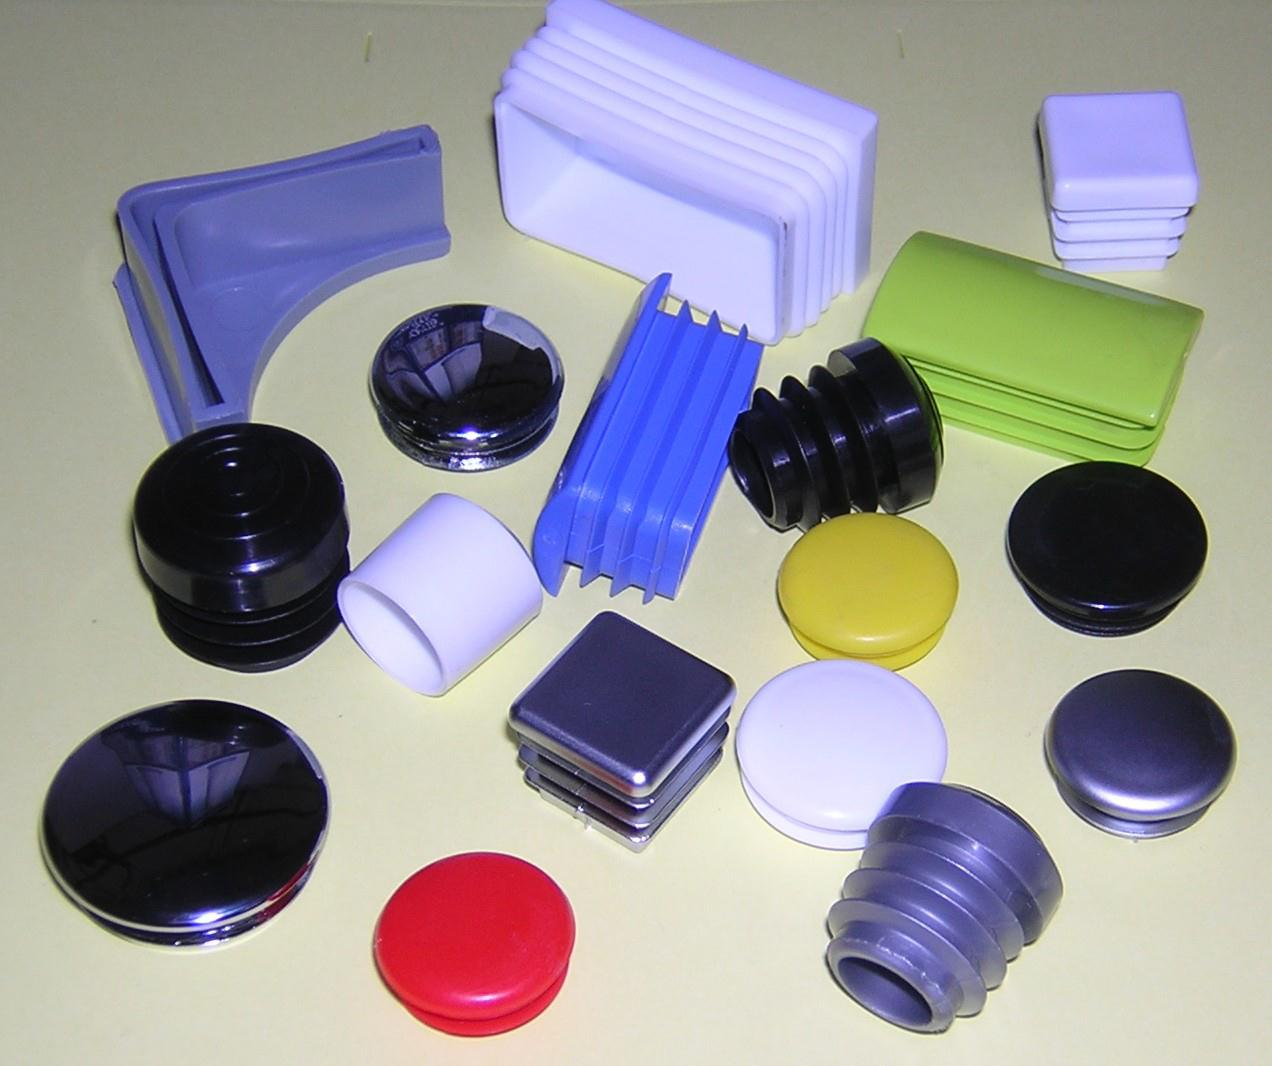 Taponería y accesorios de plásticos en Gipuzkoa